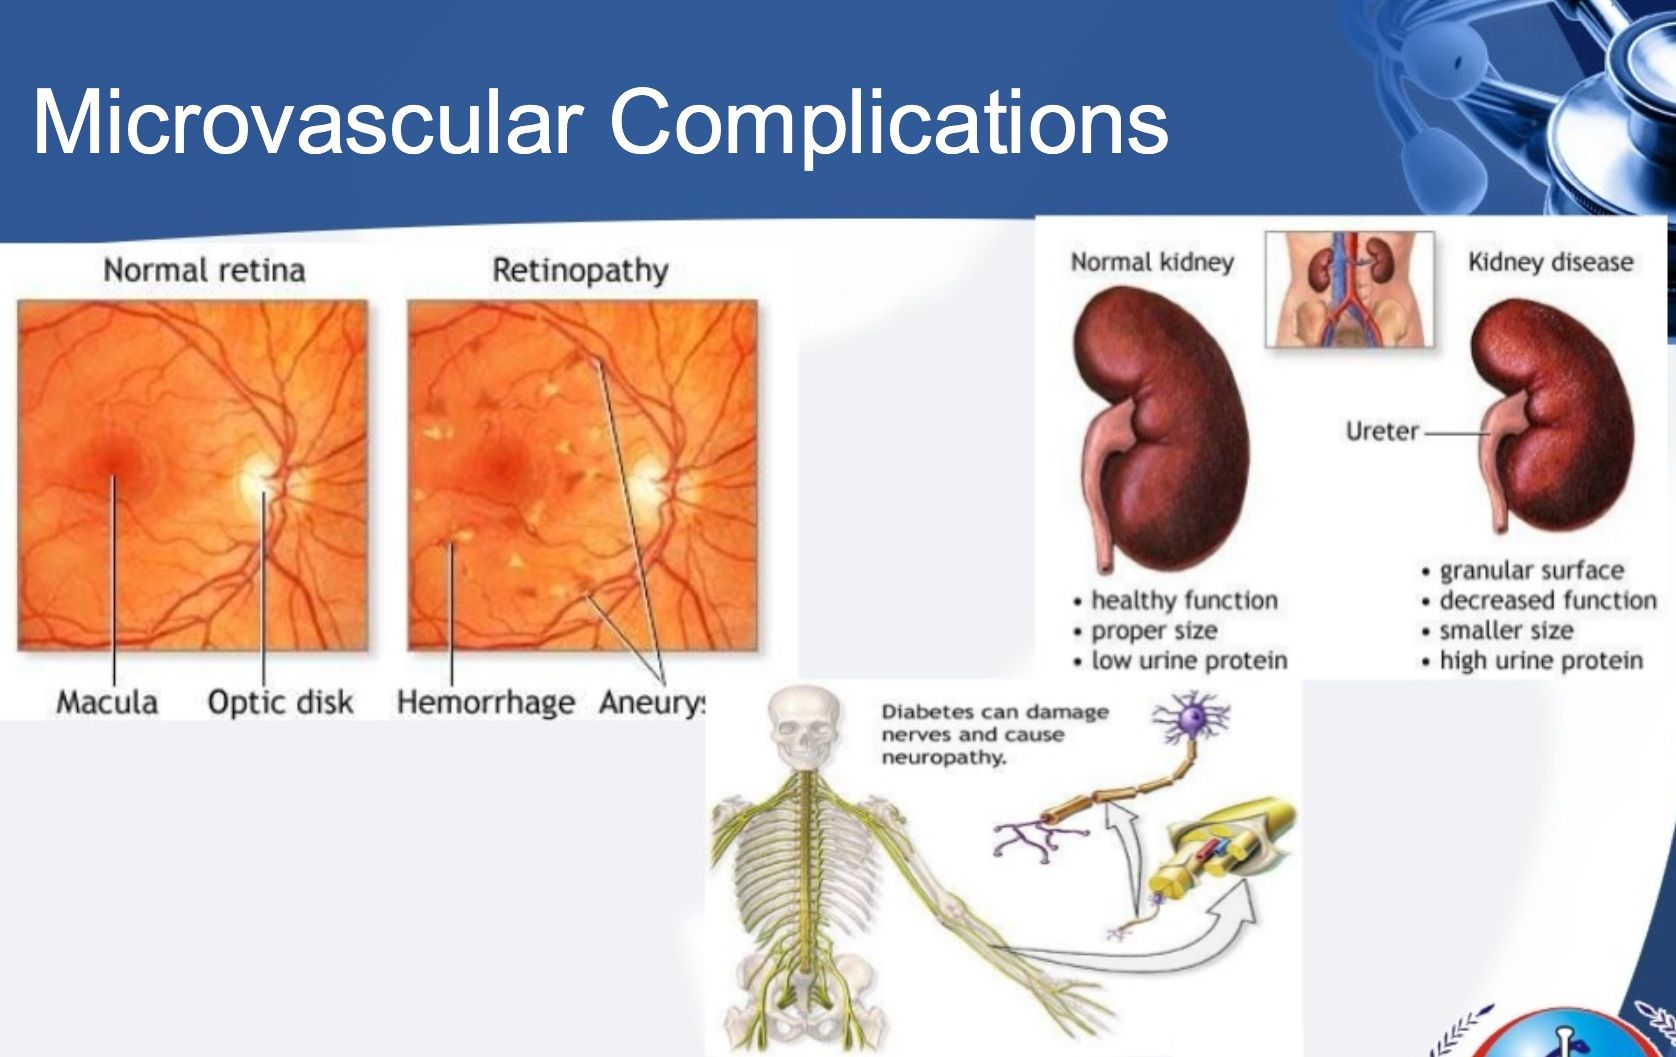 retinopatía diabetes nefropatía sangre